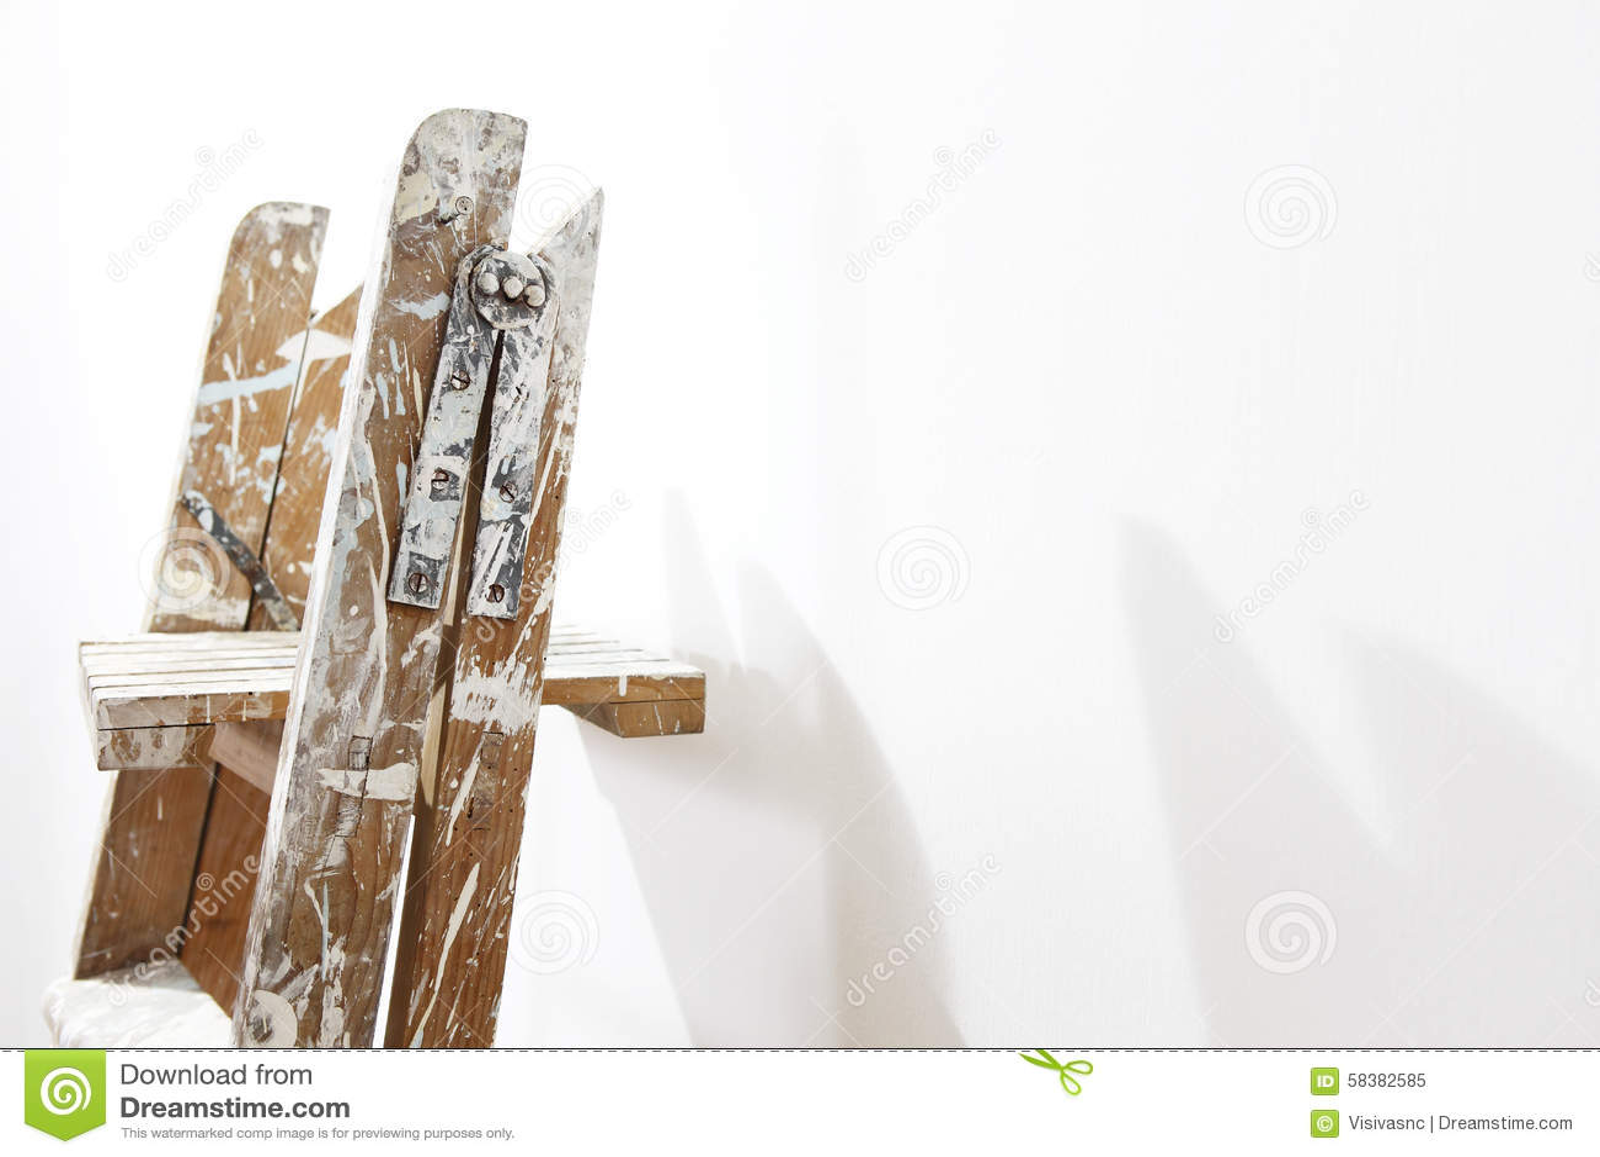 Escalera de madera del pintor pared que se inclina imagen de archivo imagen de vac o fondo - Escalera de pintor de madera ...